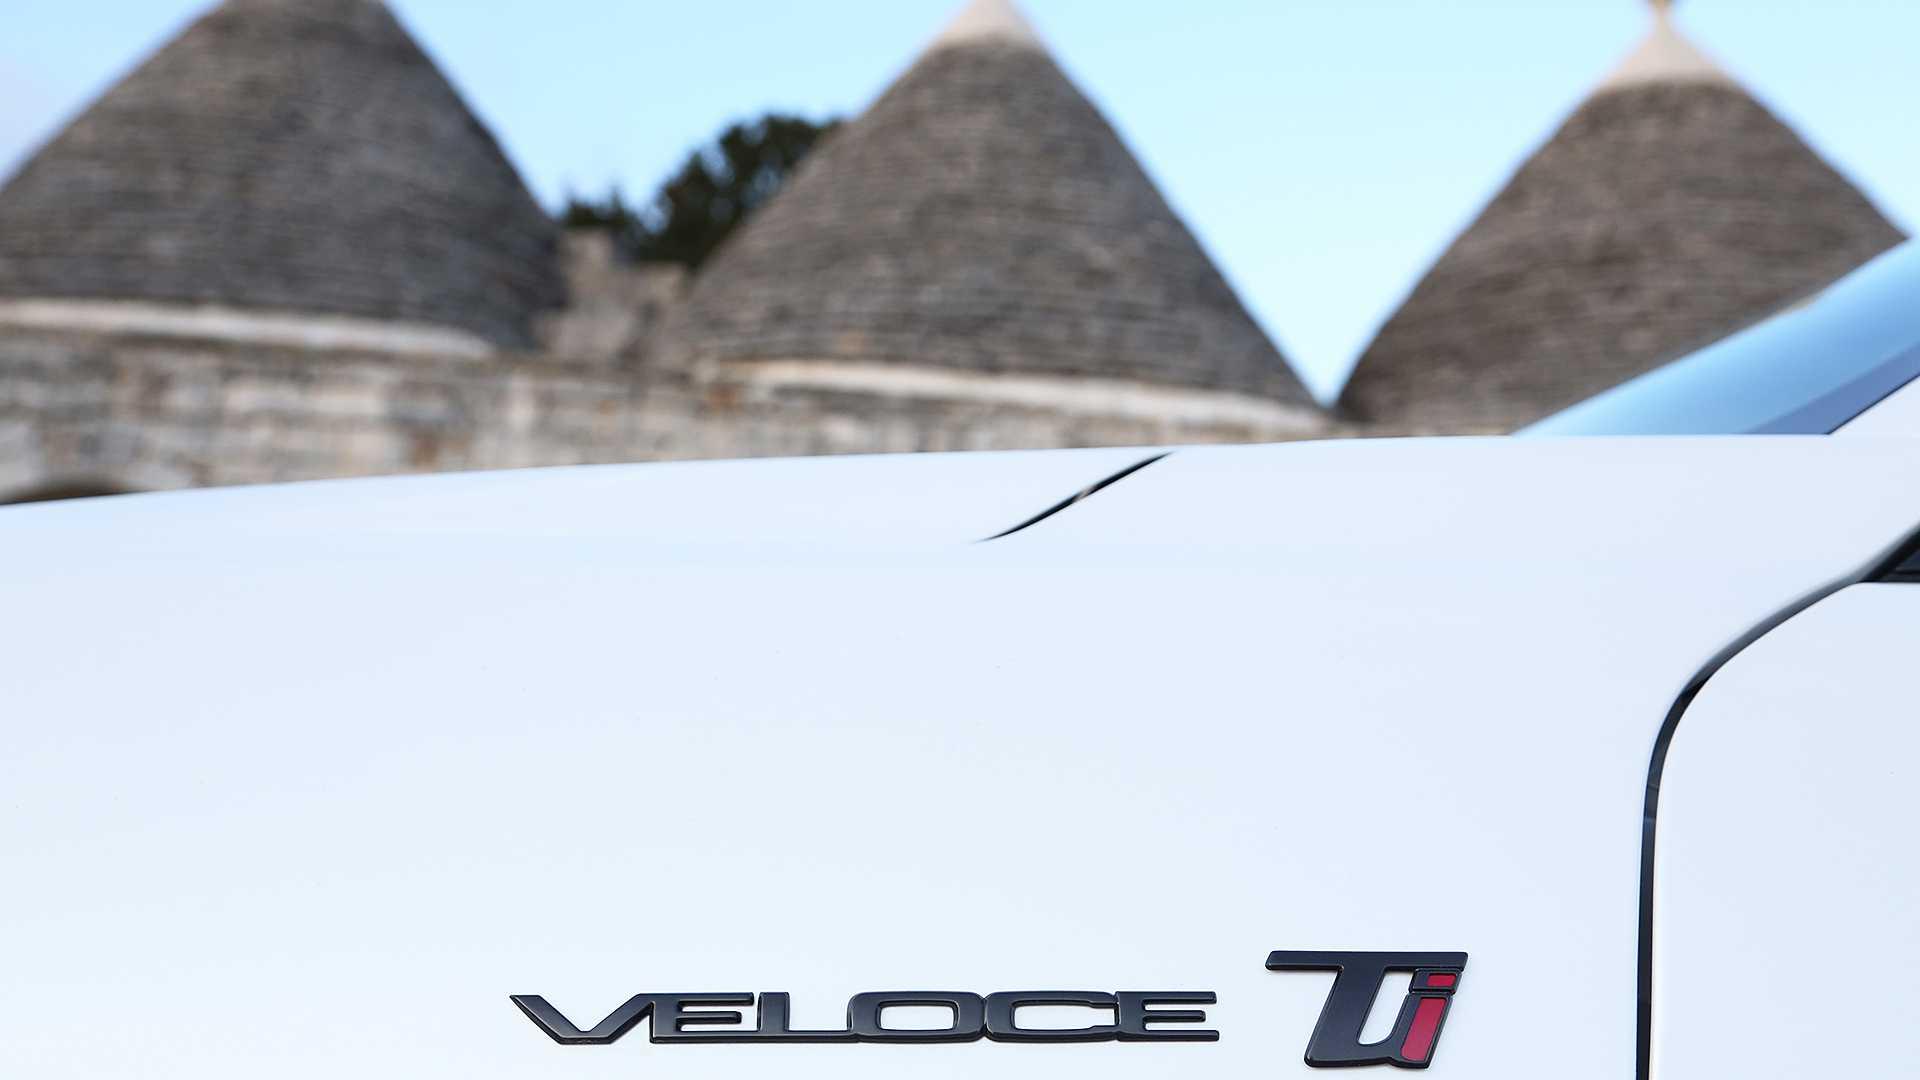 2020 Alfa Romeo Giulia, Stelvio Still Don't Feature Full